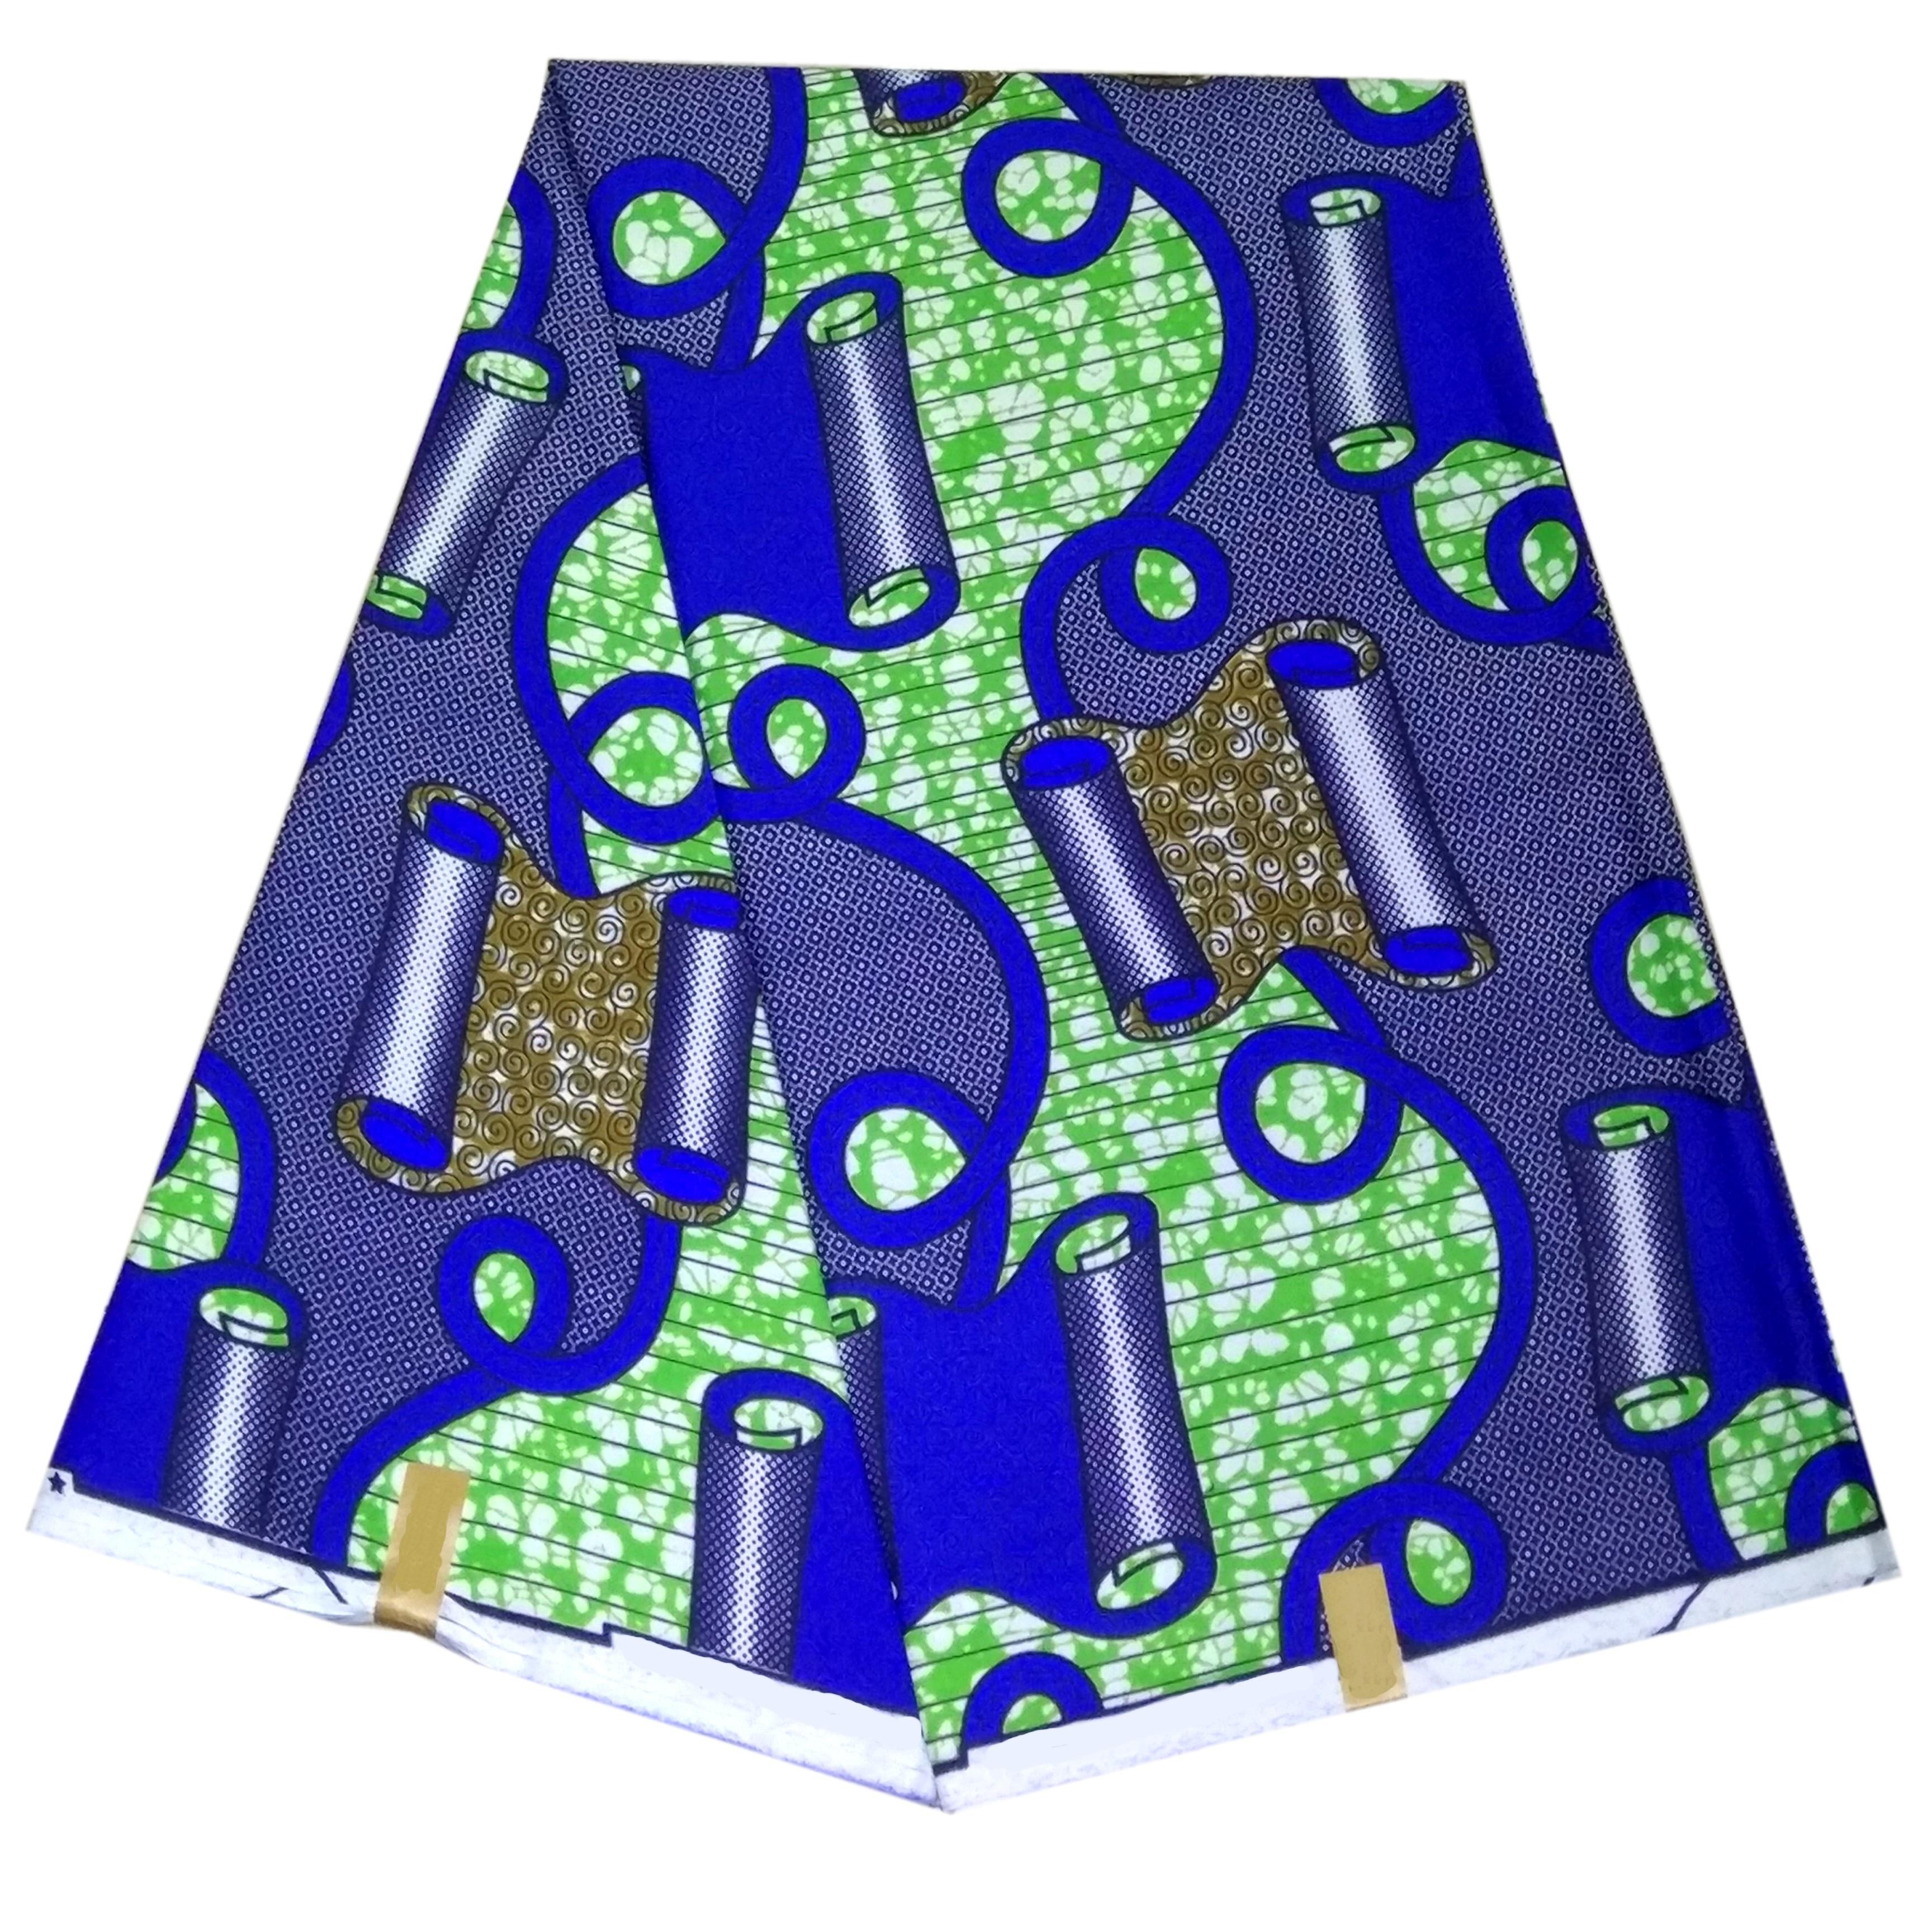 African Ankara Print Wax Fabric Veritable Wax Dutch Polyester African Fabric 6 Yards